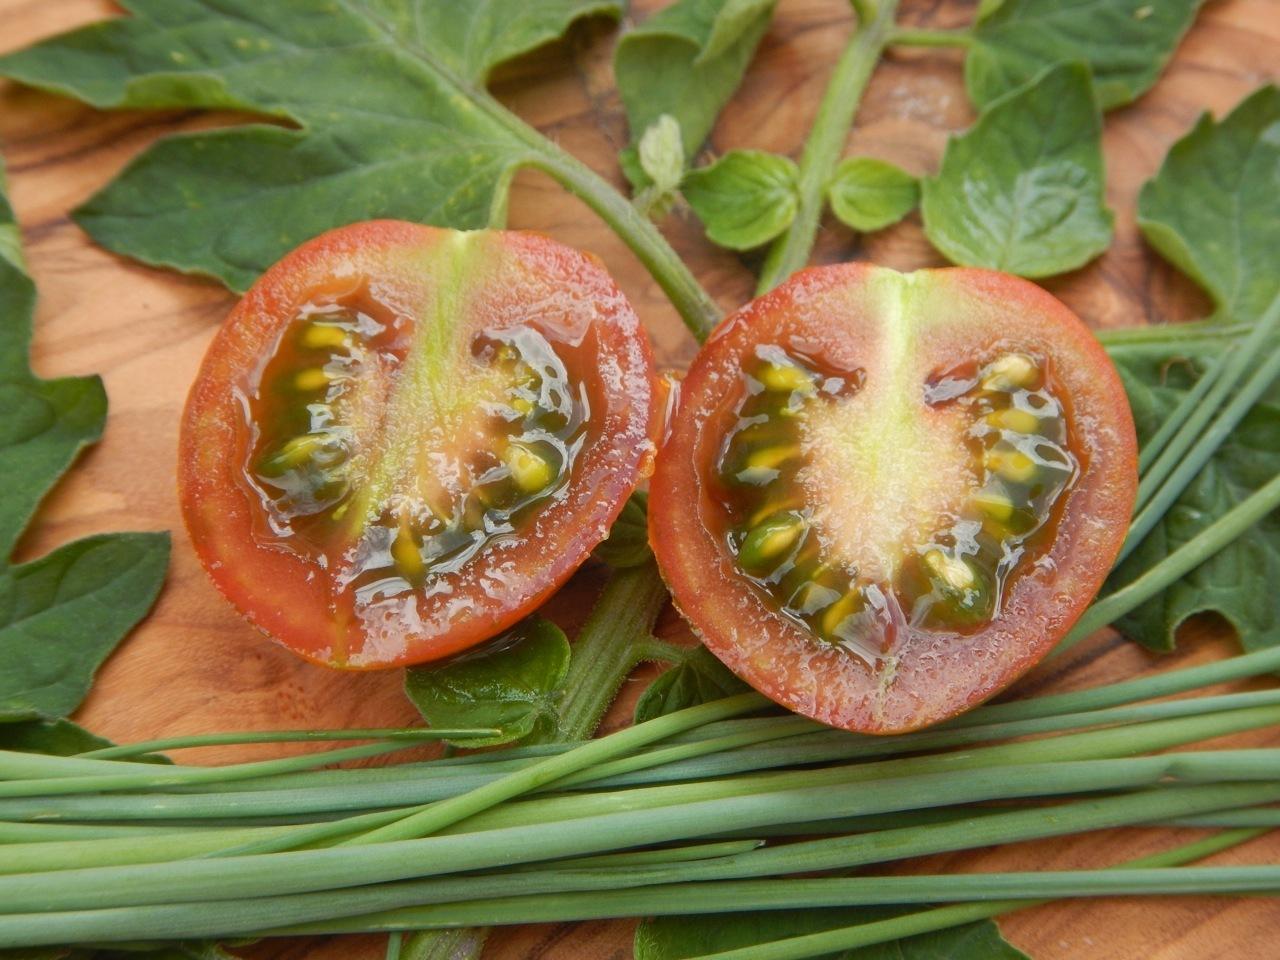 Italienische Weinbergtomate oliv-rot gestreifte Cocktailtomate Lagertomate